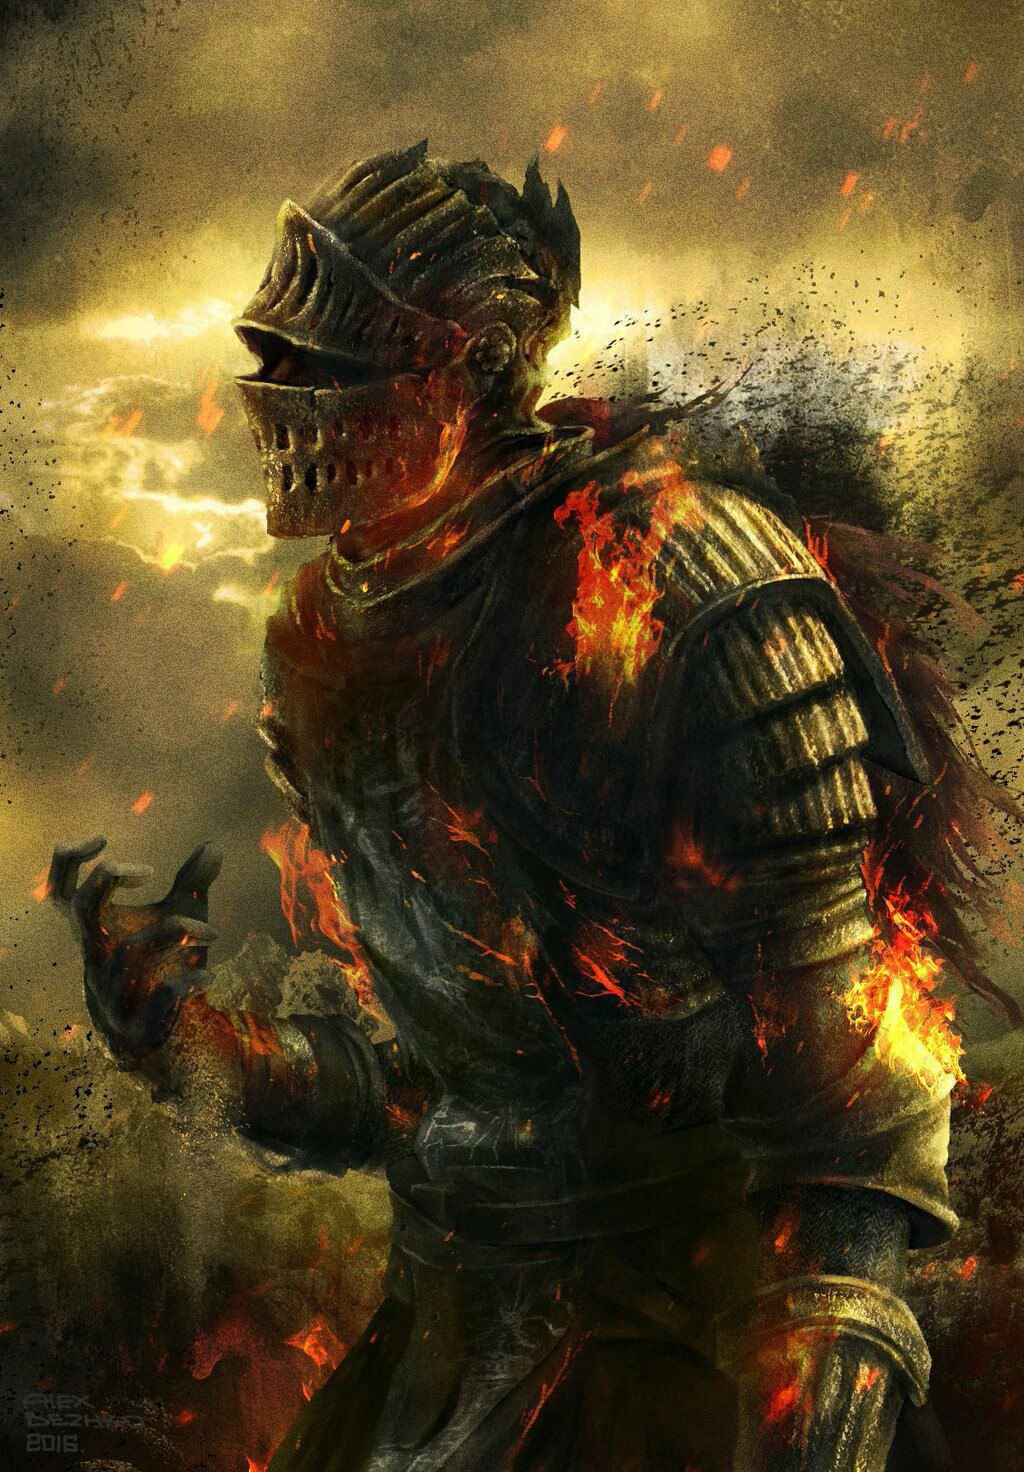 Ashen One Sif Dark Souls Arte Dark Souls Ilustracao De Personagens